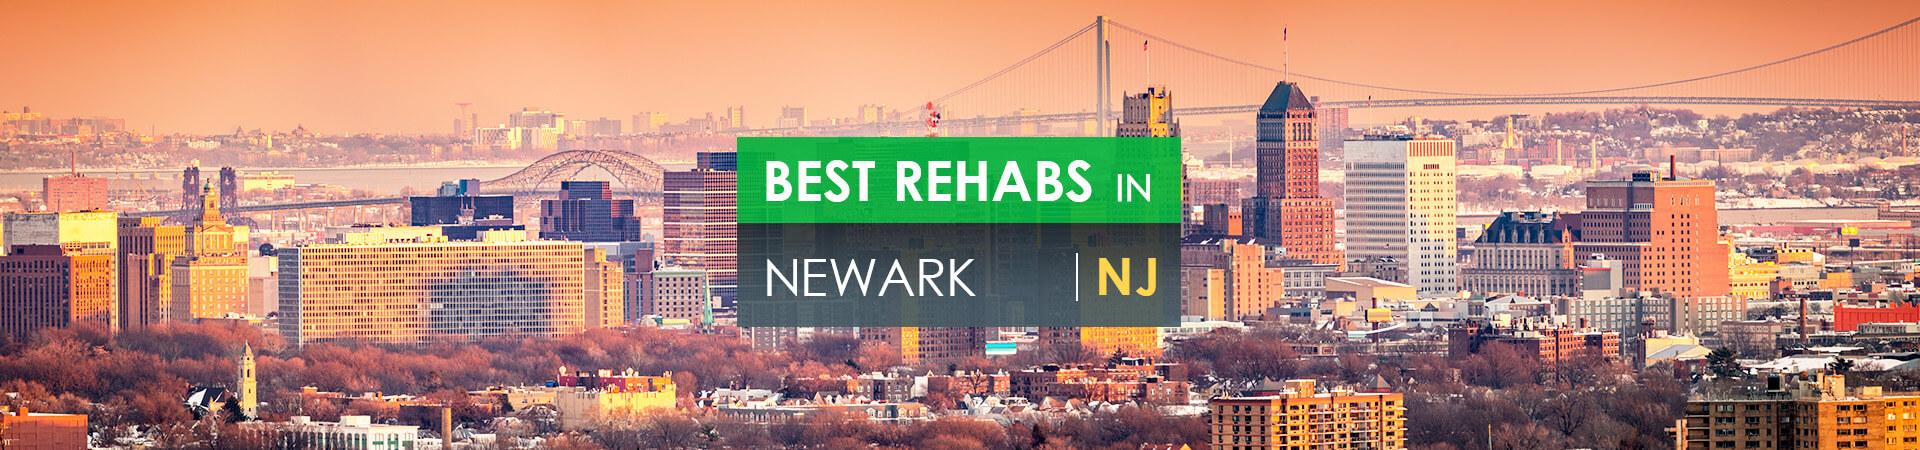 Best rehabs in Newark, NJ